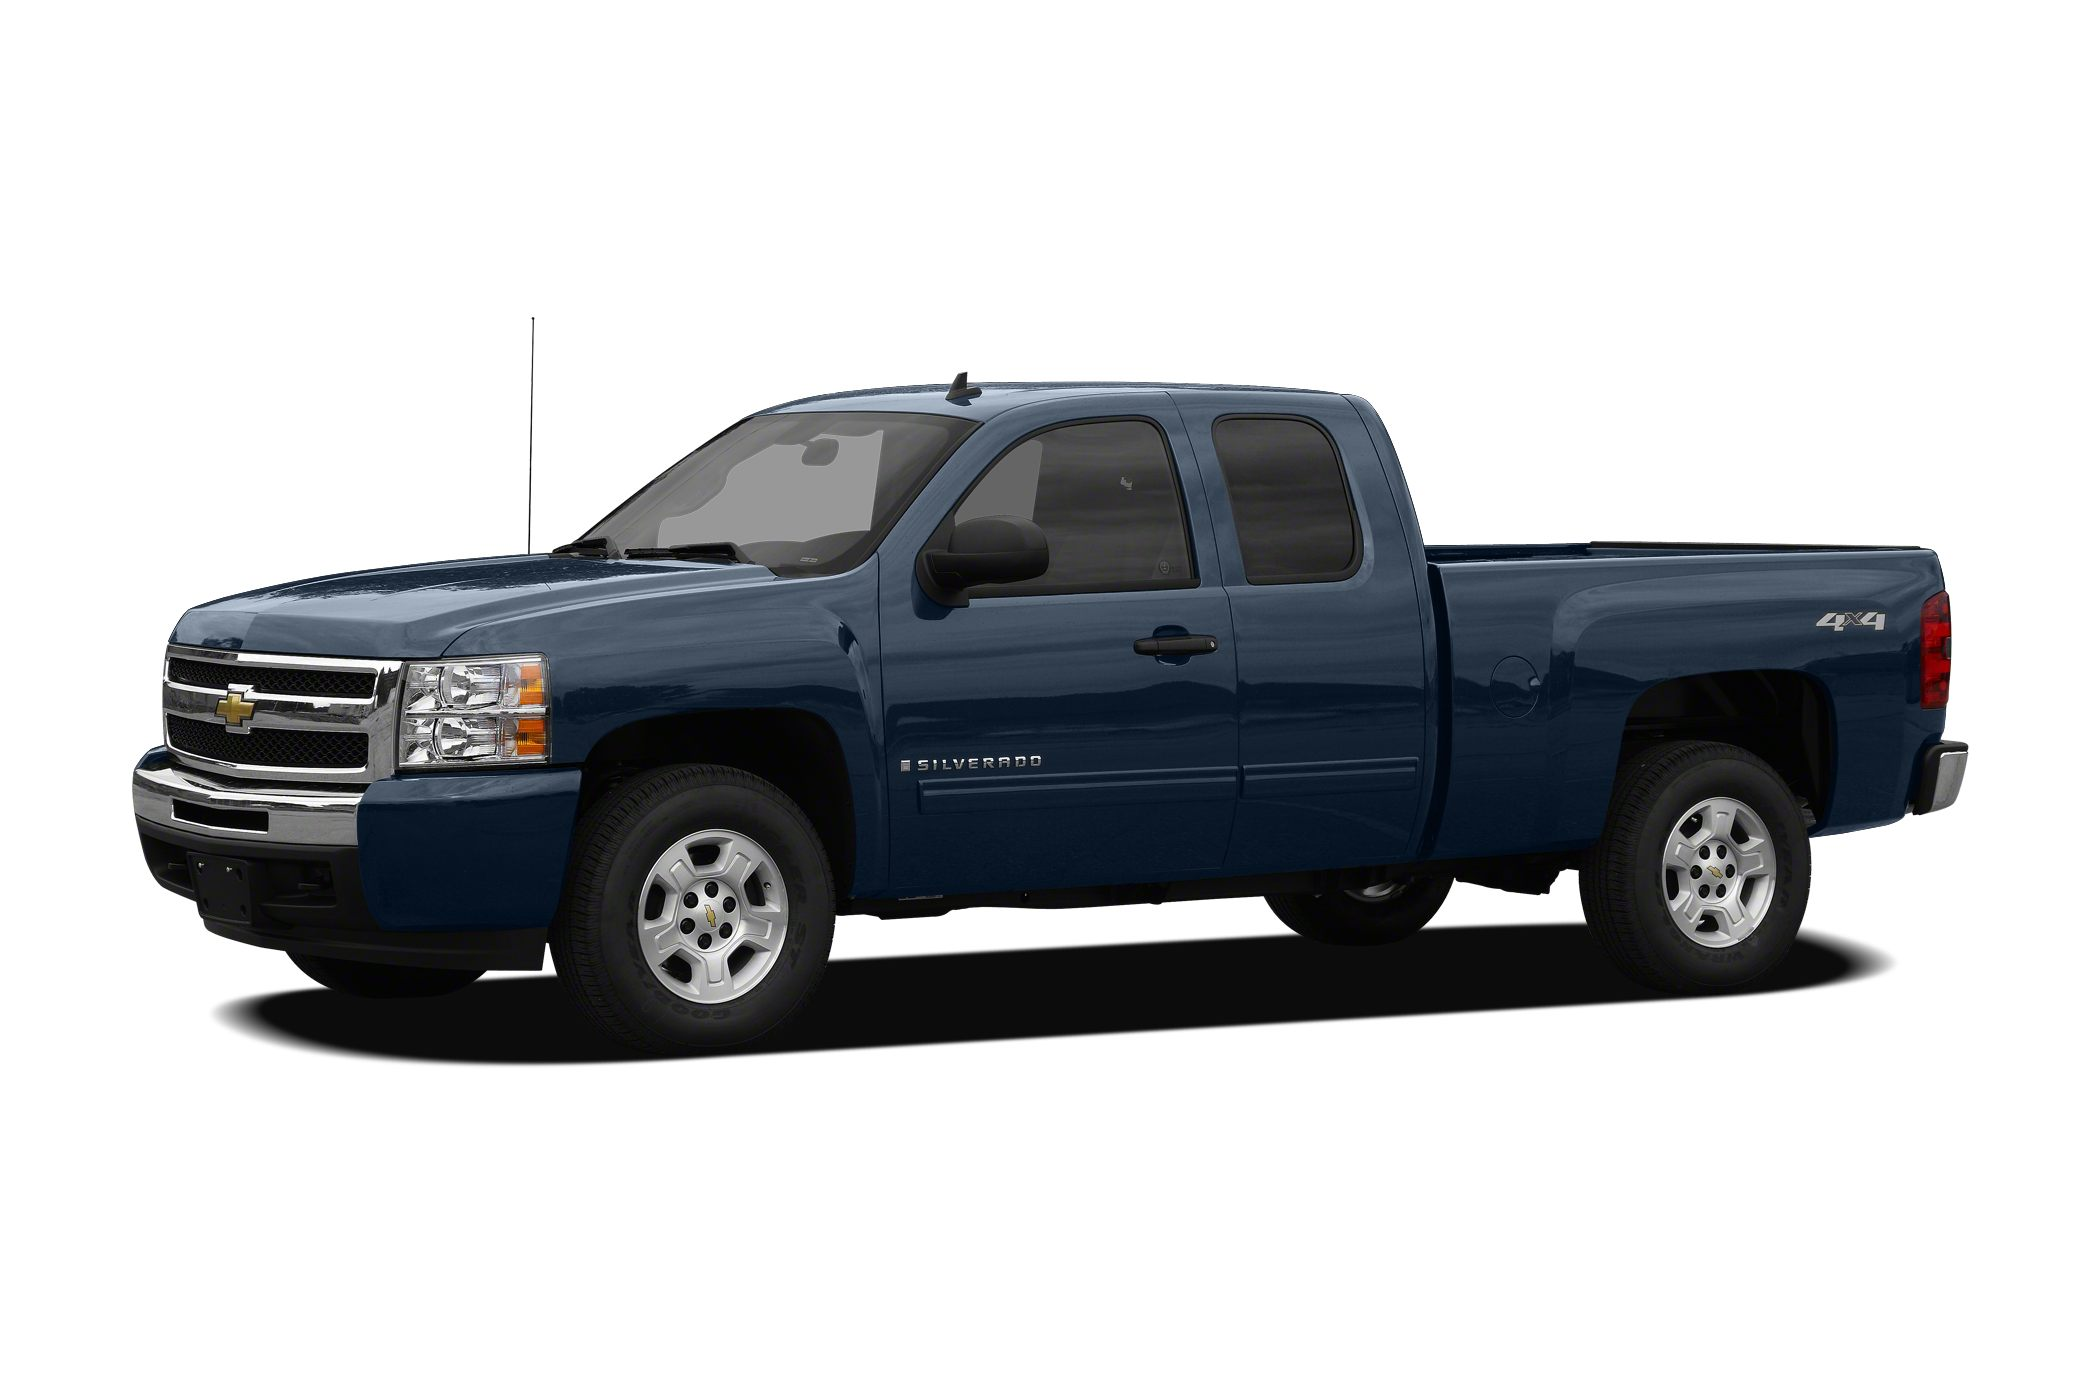 2011 Chevrolet Silverado 1500 Lt 4x4 Extended Cab 8 Ft Box 157 5